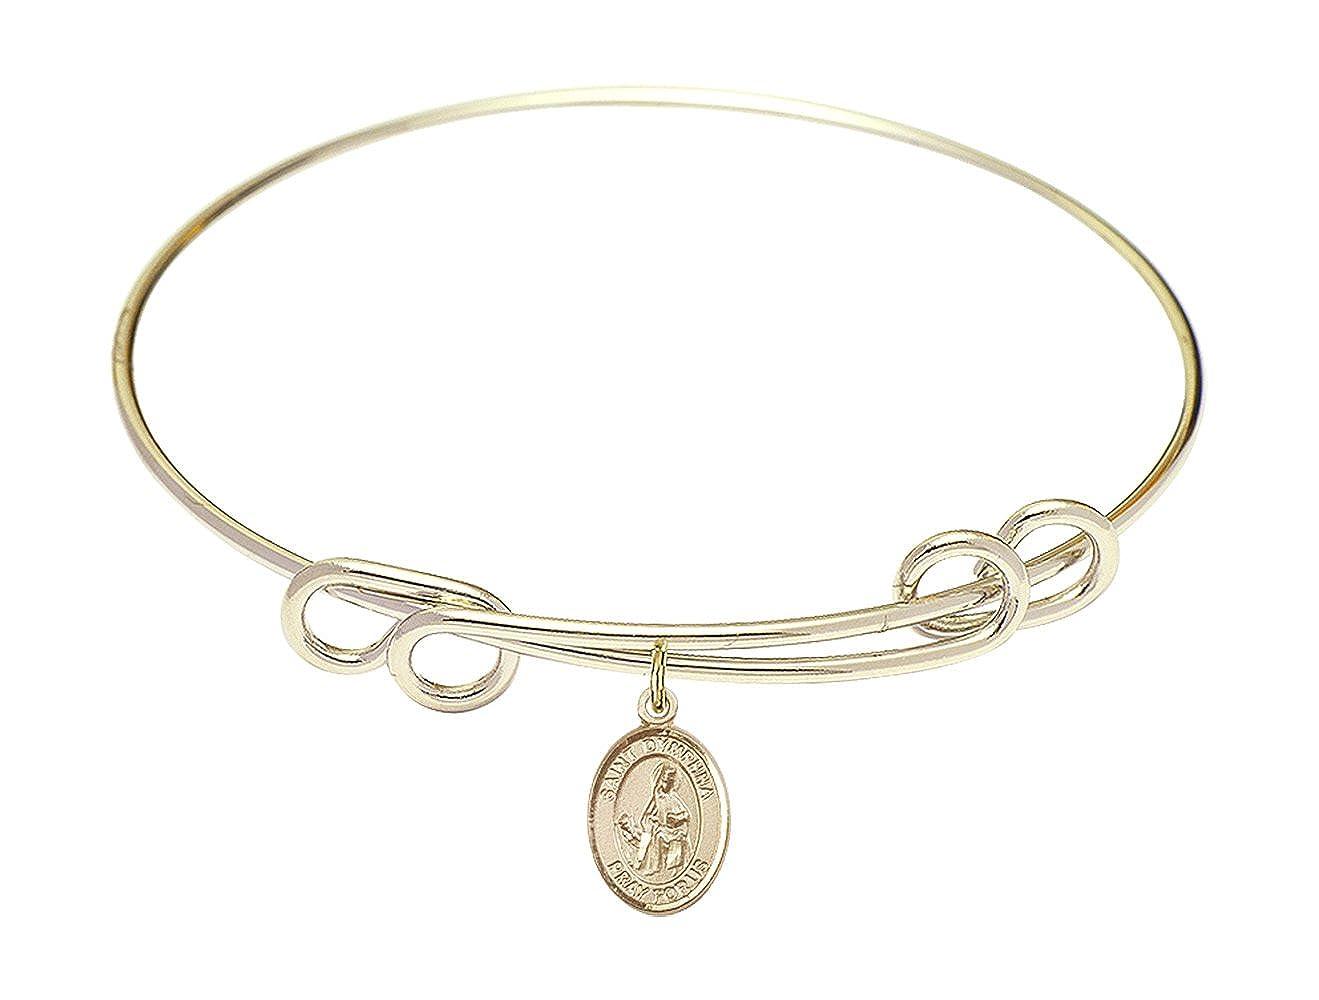 DiamondJewelryNY Double Loop Bangle Bracelet with a St Dymphna Charm.